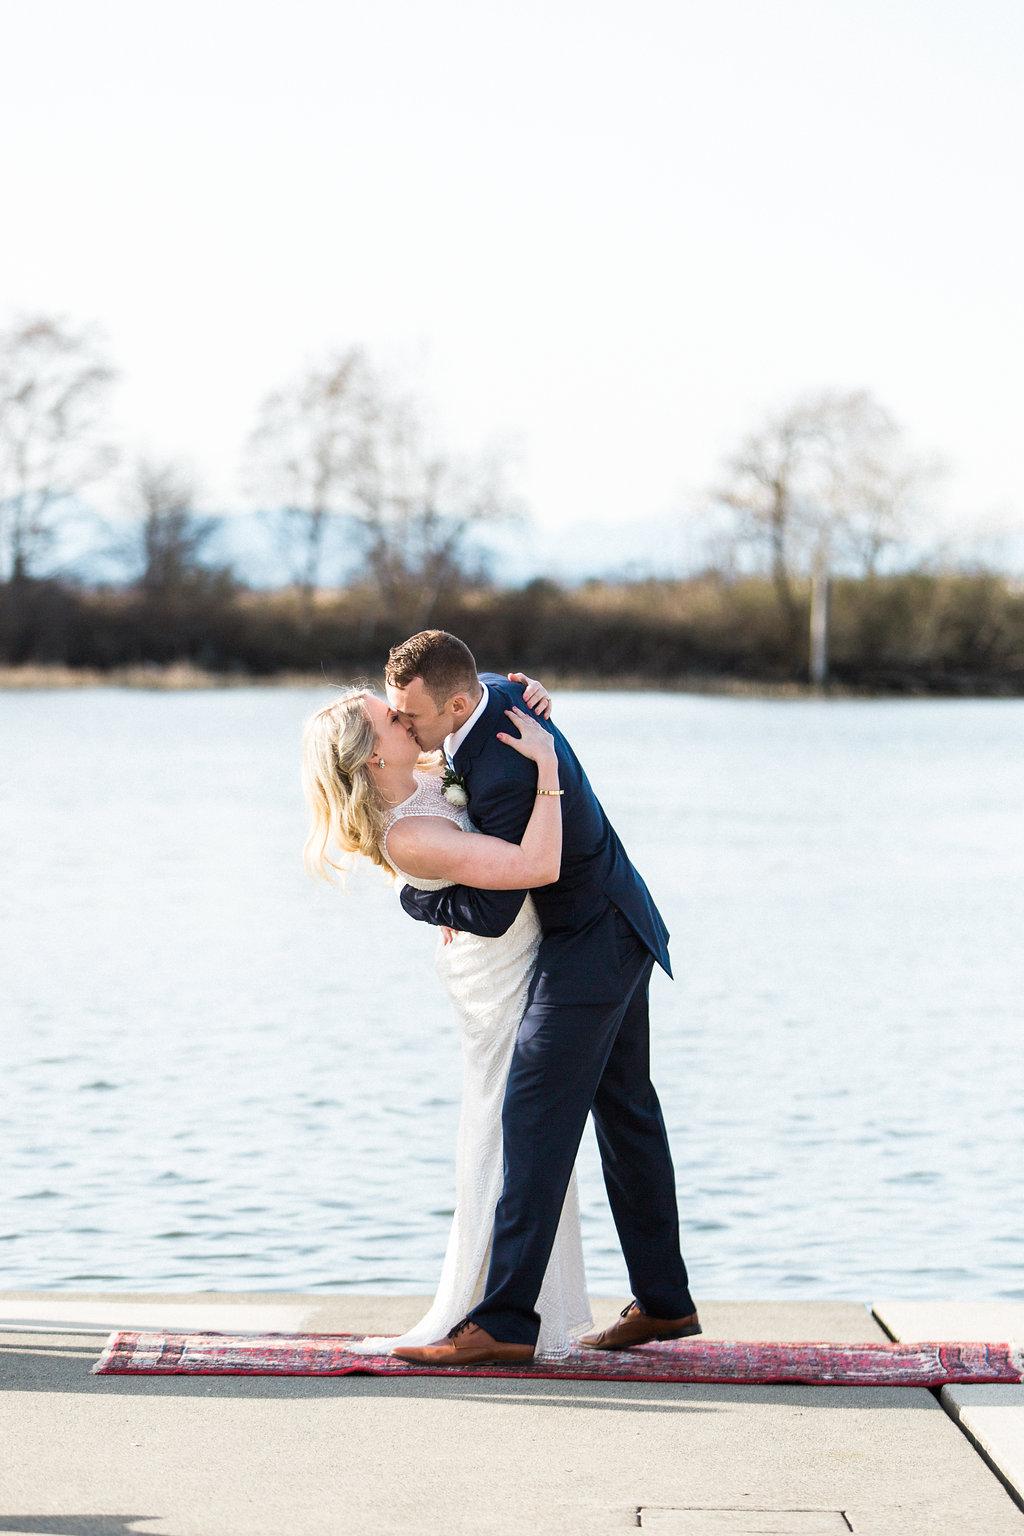 Vancouver Wedding Planner UBC Boathouse Wedding - L&M10.jpg